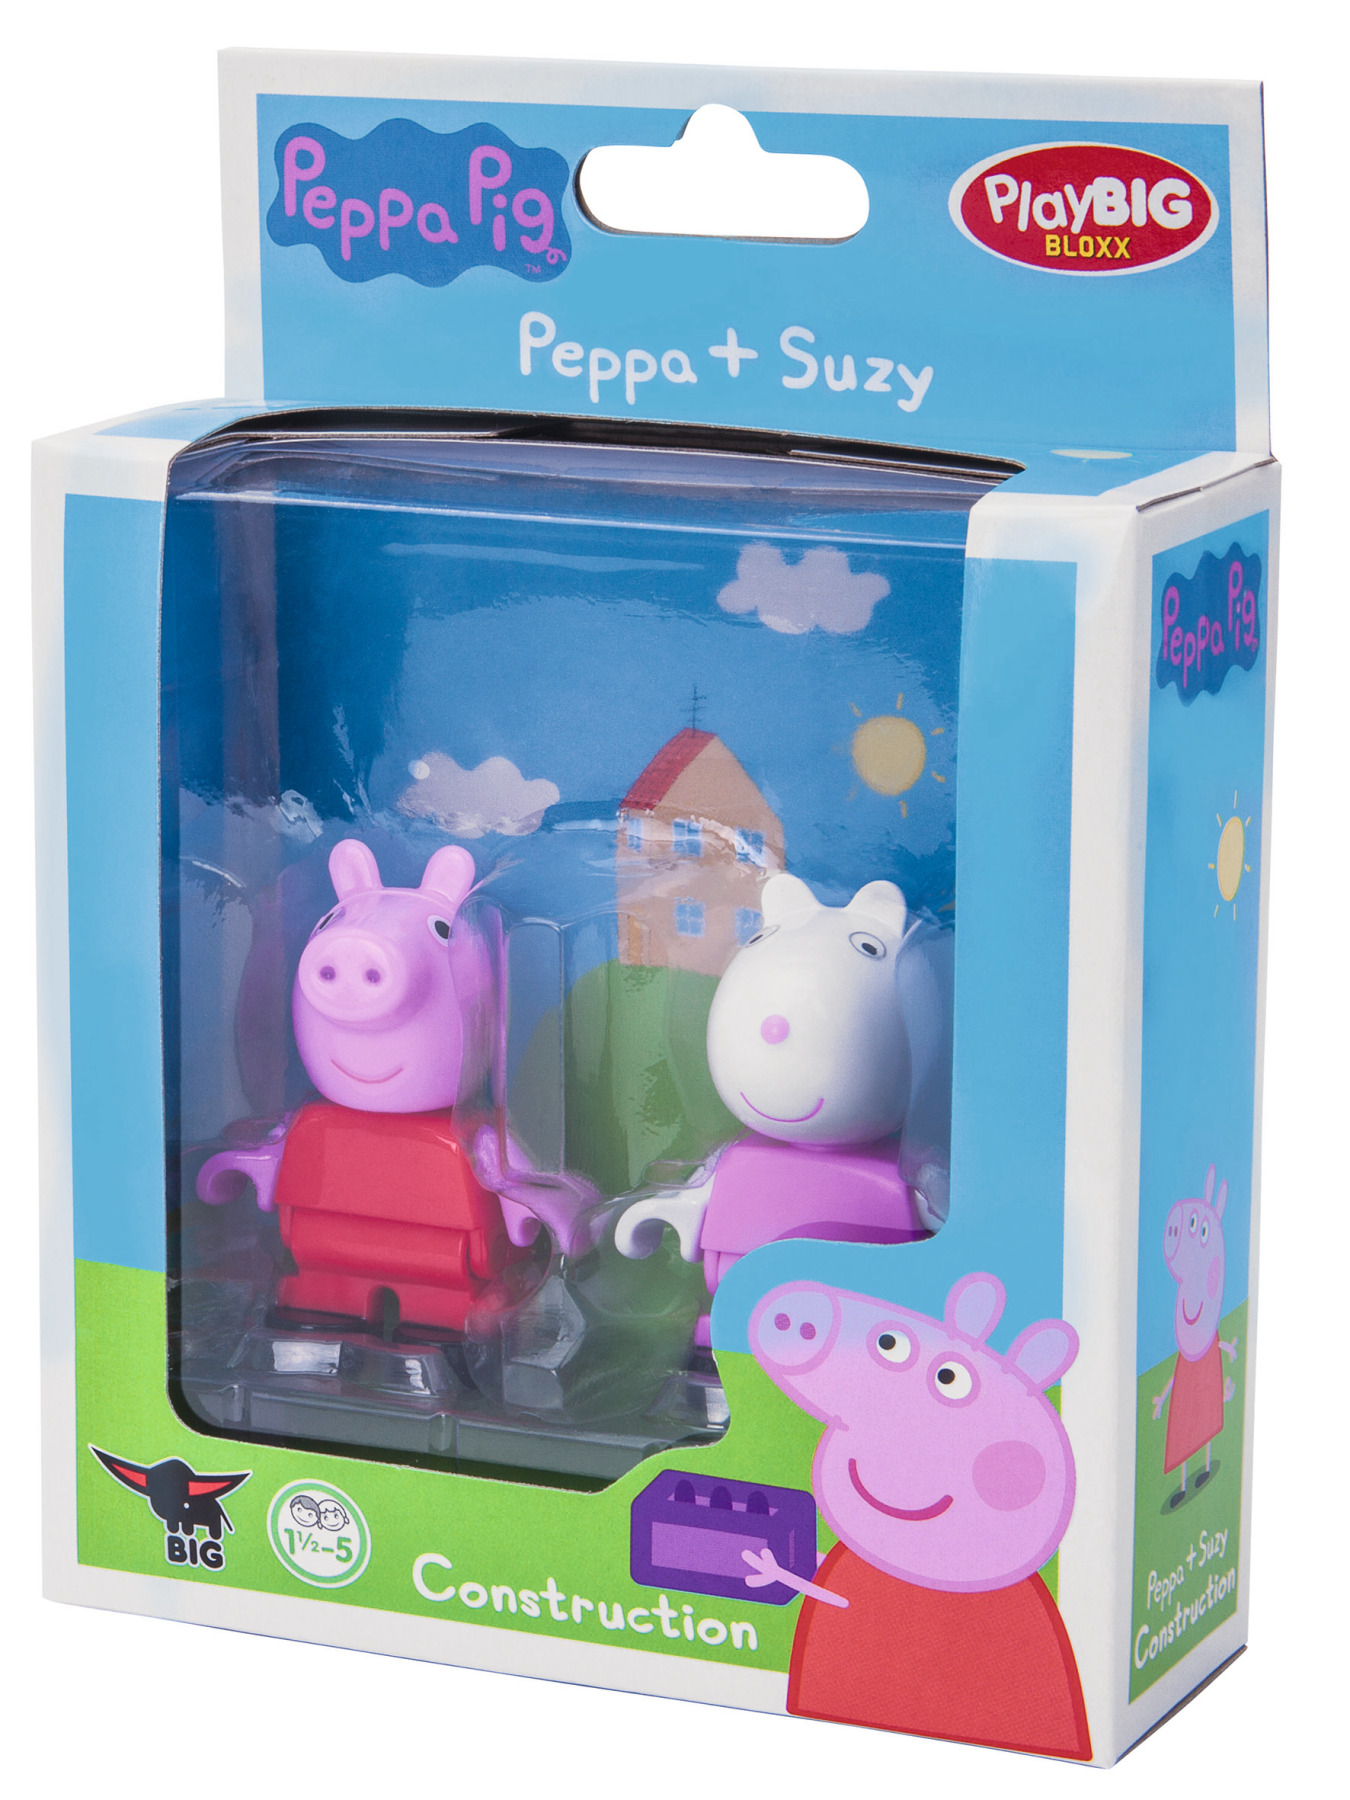 playbig bloxx peppa pig - peppa + suzy